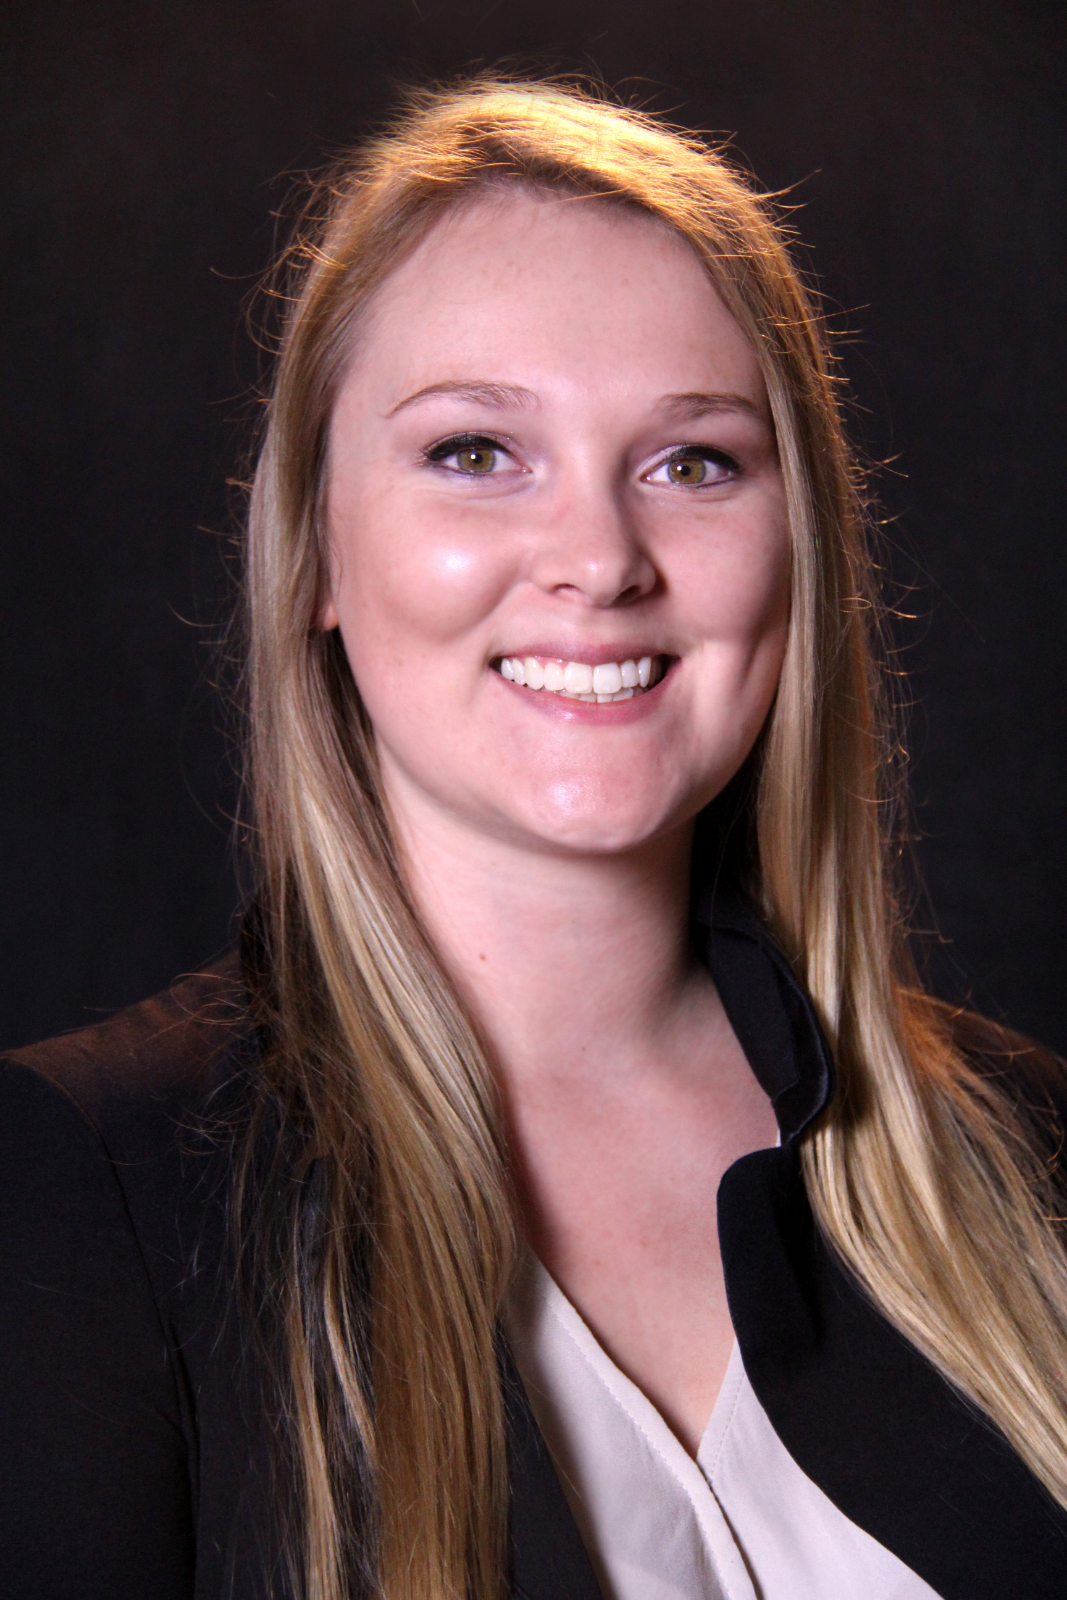 SCA Hires New Dance Coach